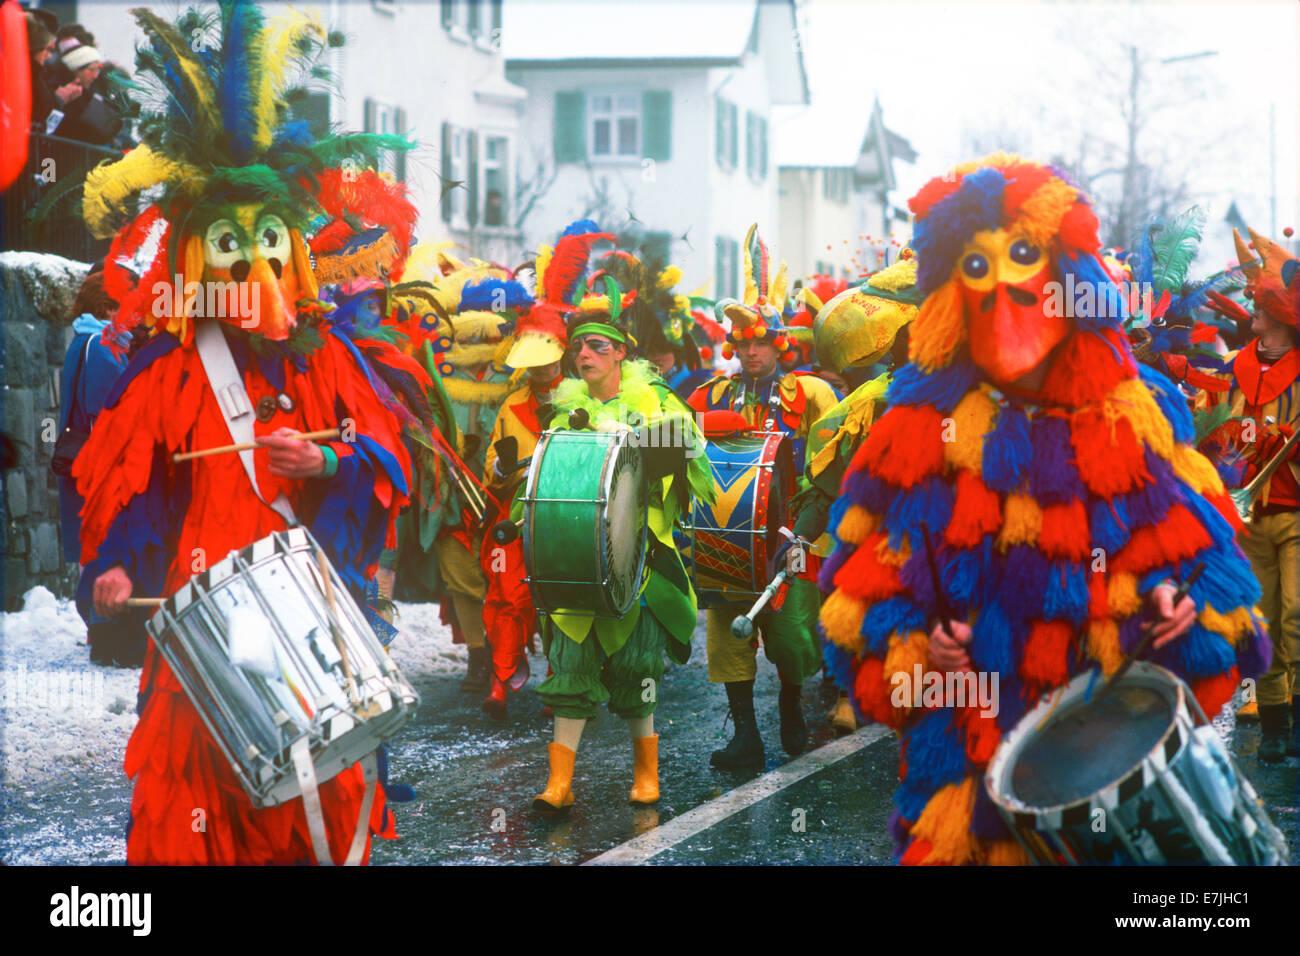 Mardi Gras, Schaan, Liechtenstein - Stock Image